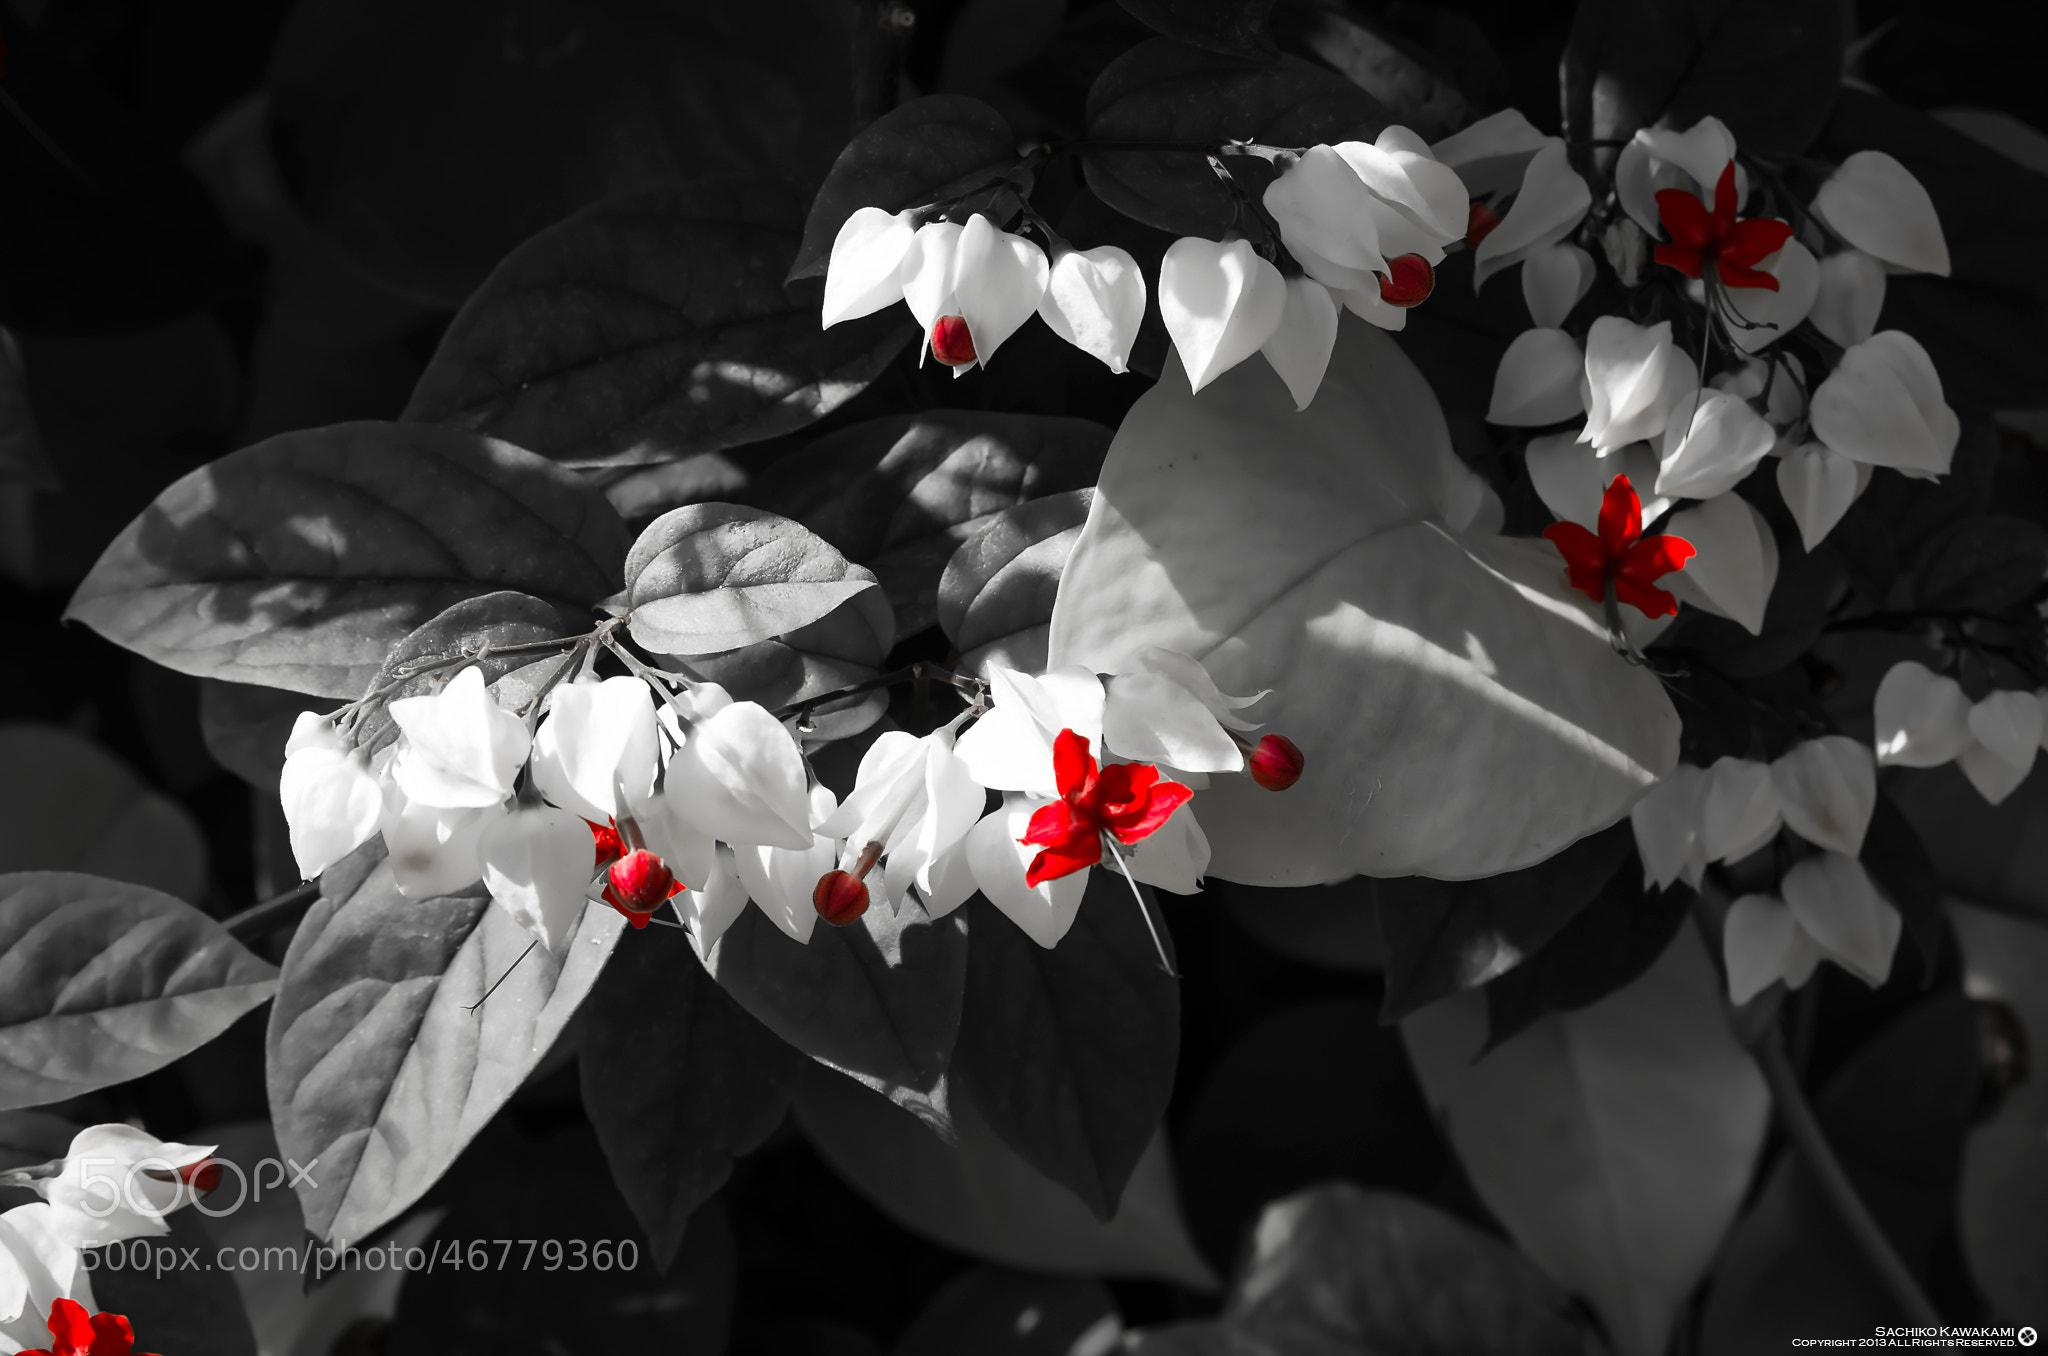 Photograph Red and black balance by Sachiko Kawakami on 500px